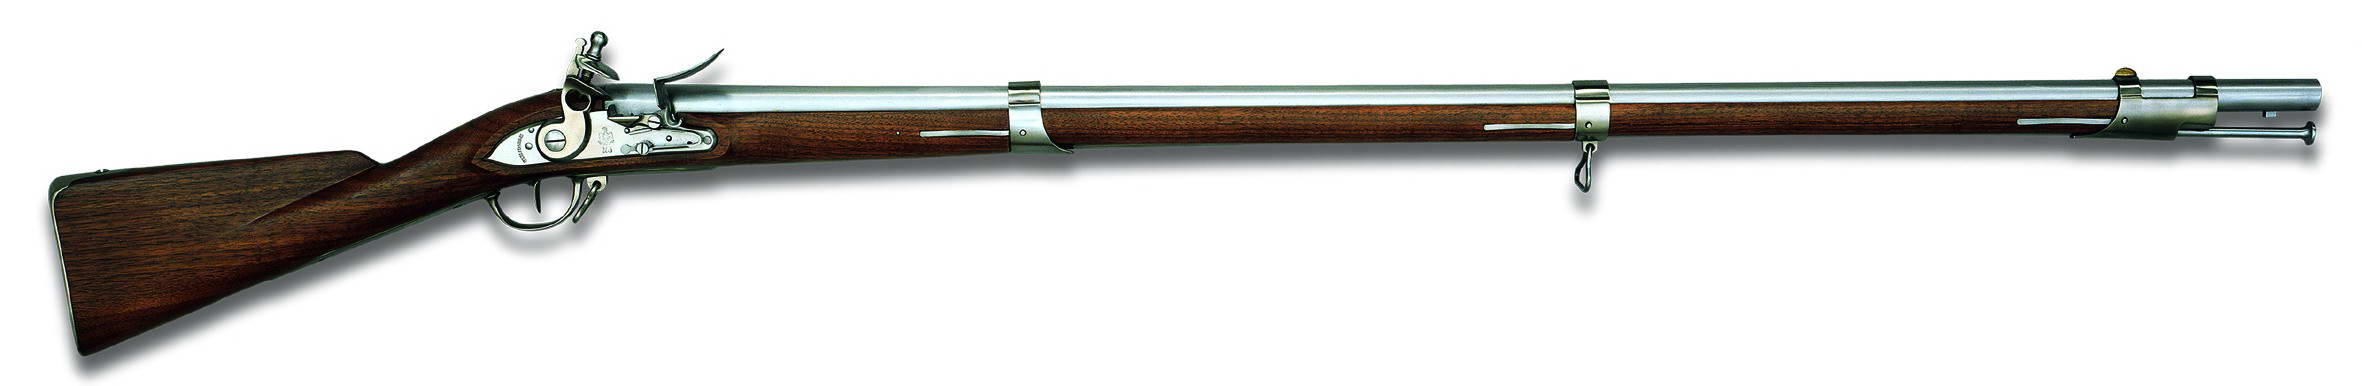 Image result for flintlock rifle